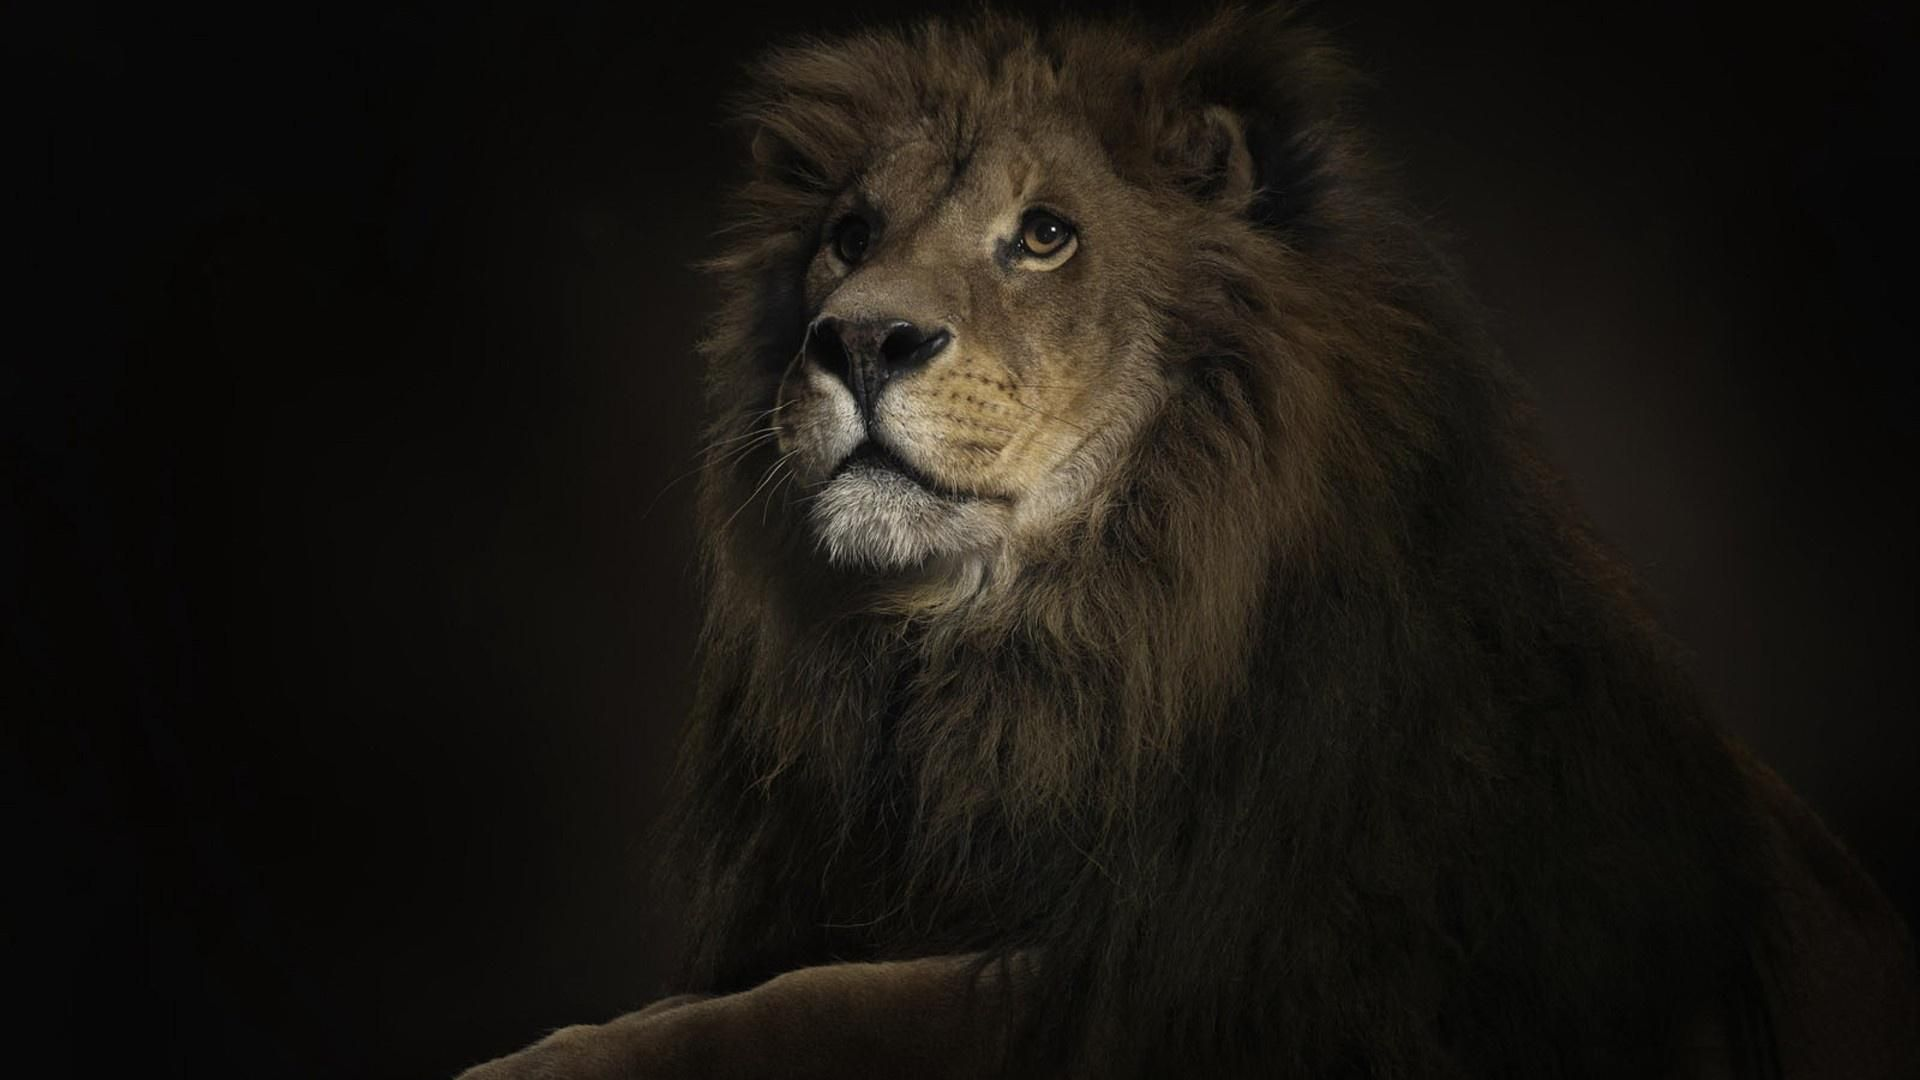 Lion Black And White Wallpaper Phone On Wallpaper 1080p Hd Leao De Fogo Papel De Parede De Arte Quadros Pintados